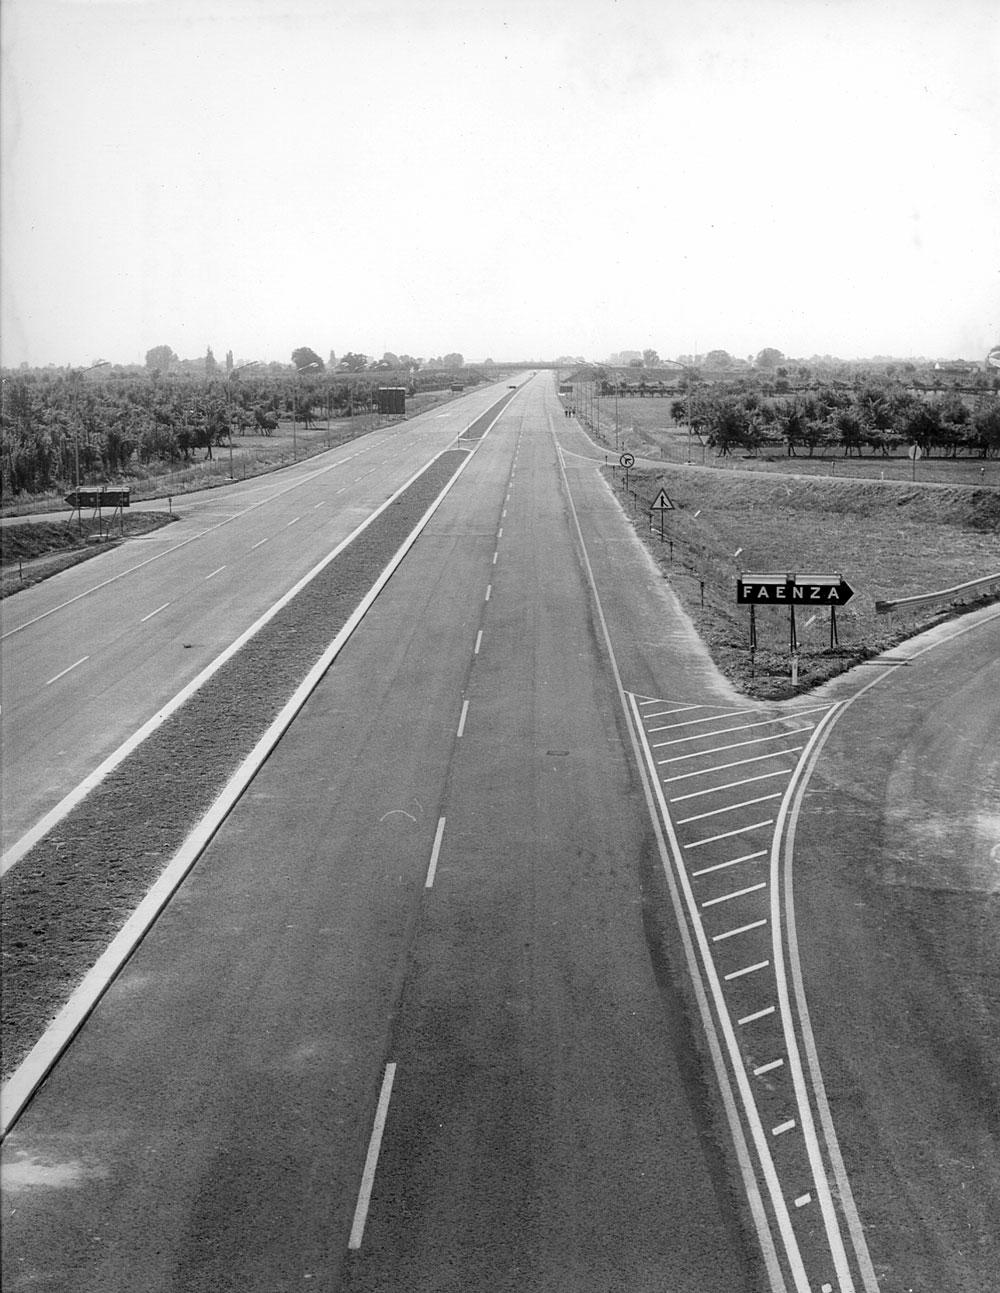 Emilia Romagna, autostrada A14 Bologna-Canosa, uscita di Faenza  (Archivio storico Anas)